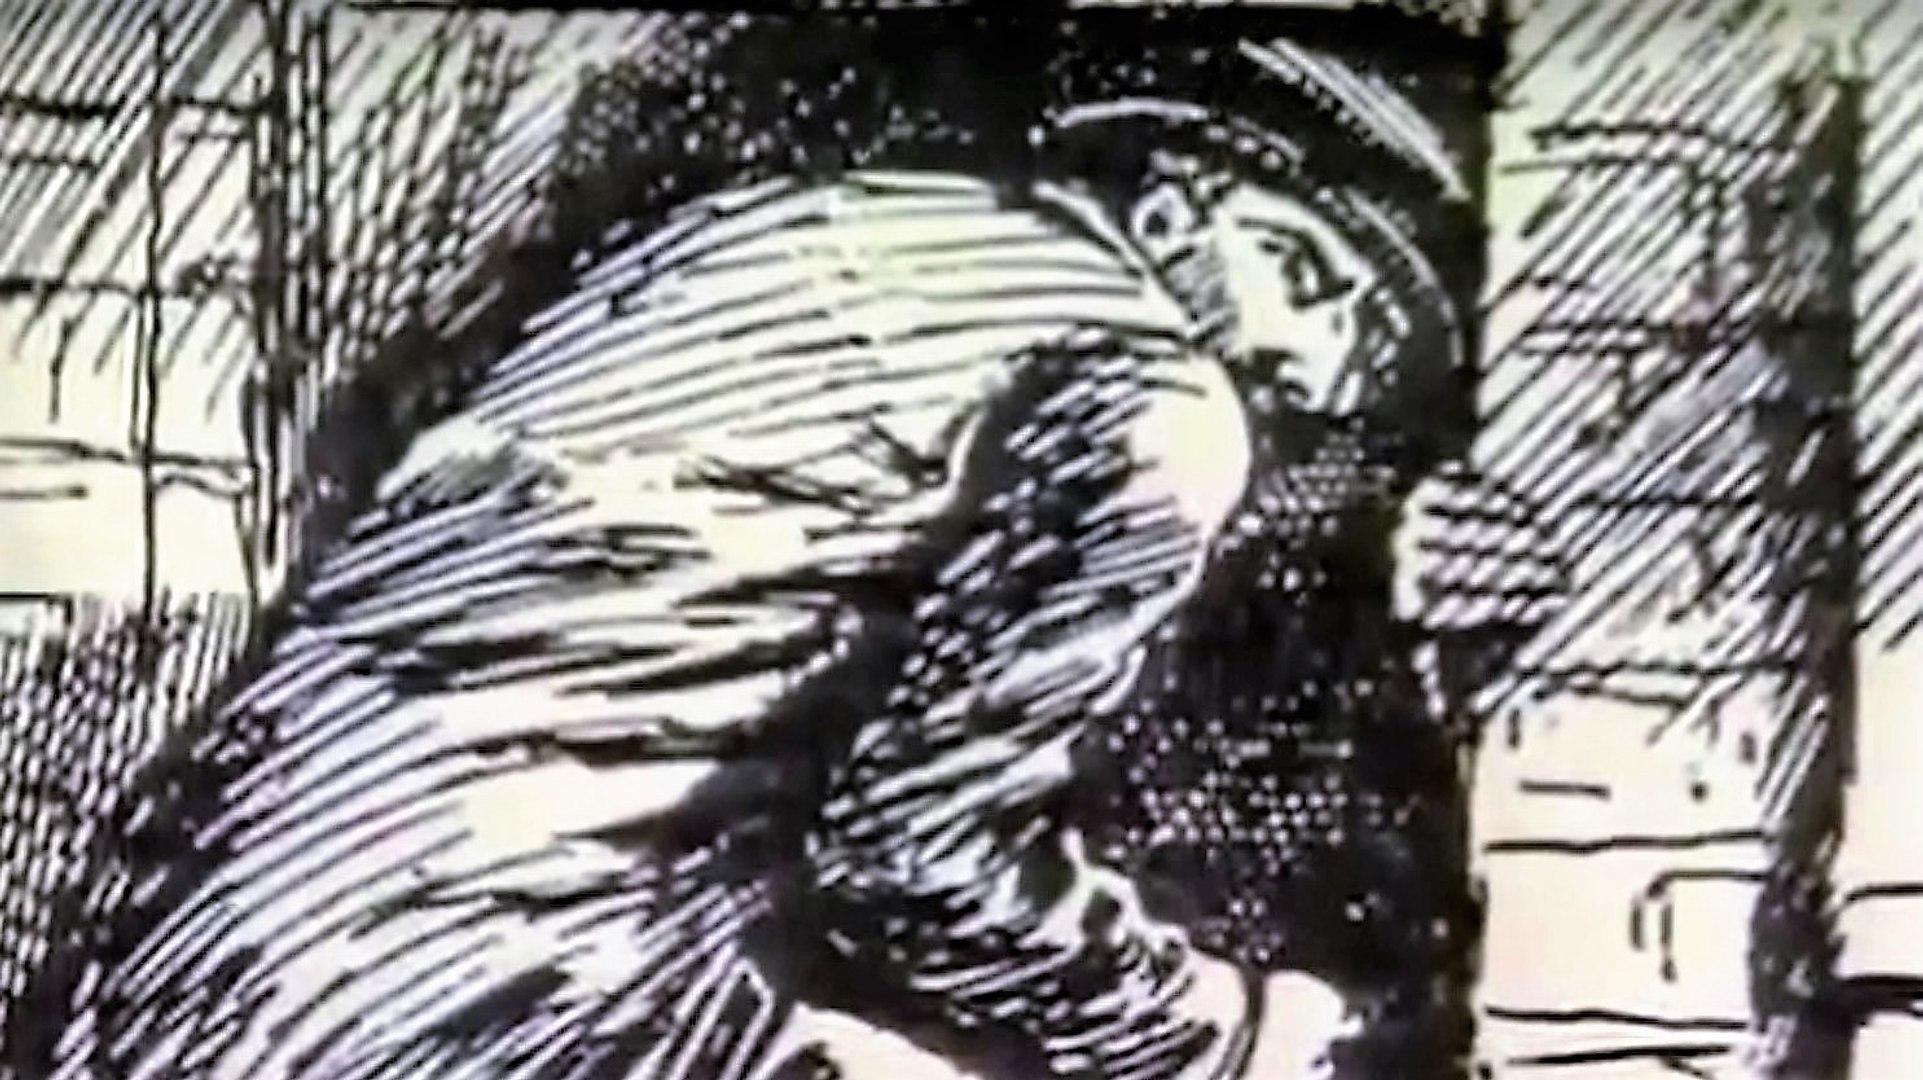 JACK THE RIPPER - SERIAL KILLER DOCUMENTARY - Serial Killers Biography History Documentaries (full d